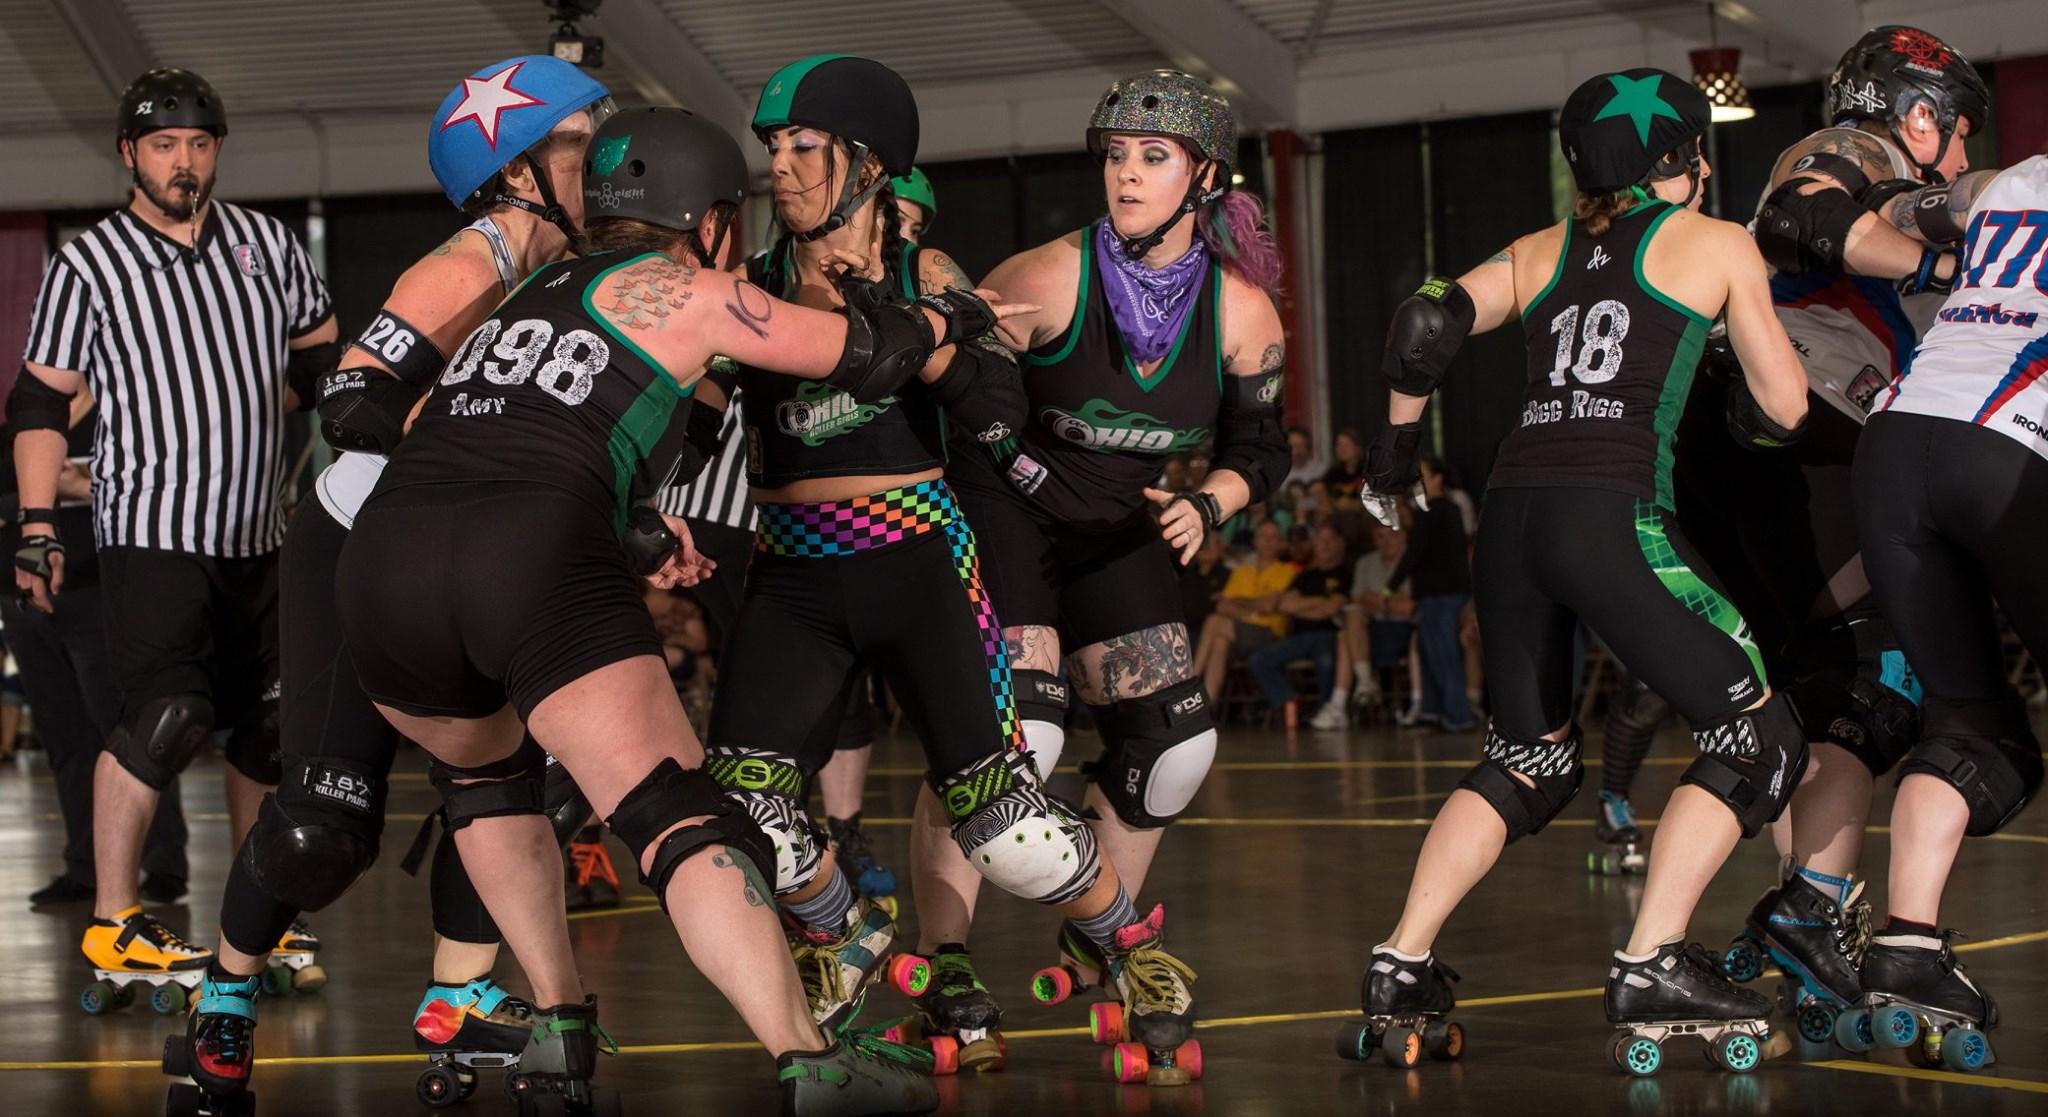 Amy Chainsaw Klover blocking Rigg jamming OHRD v Brandywine 6.8.19 Chris Baker